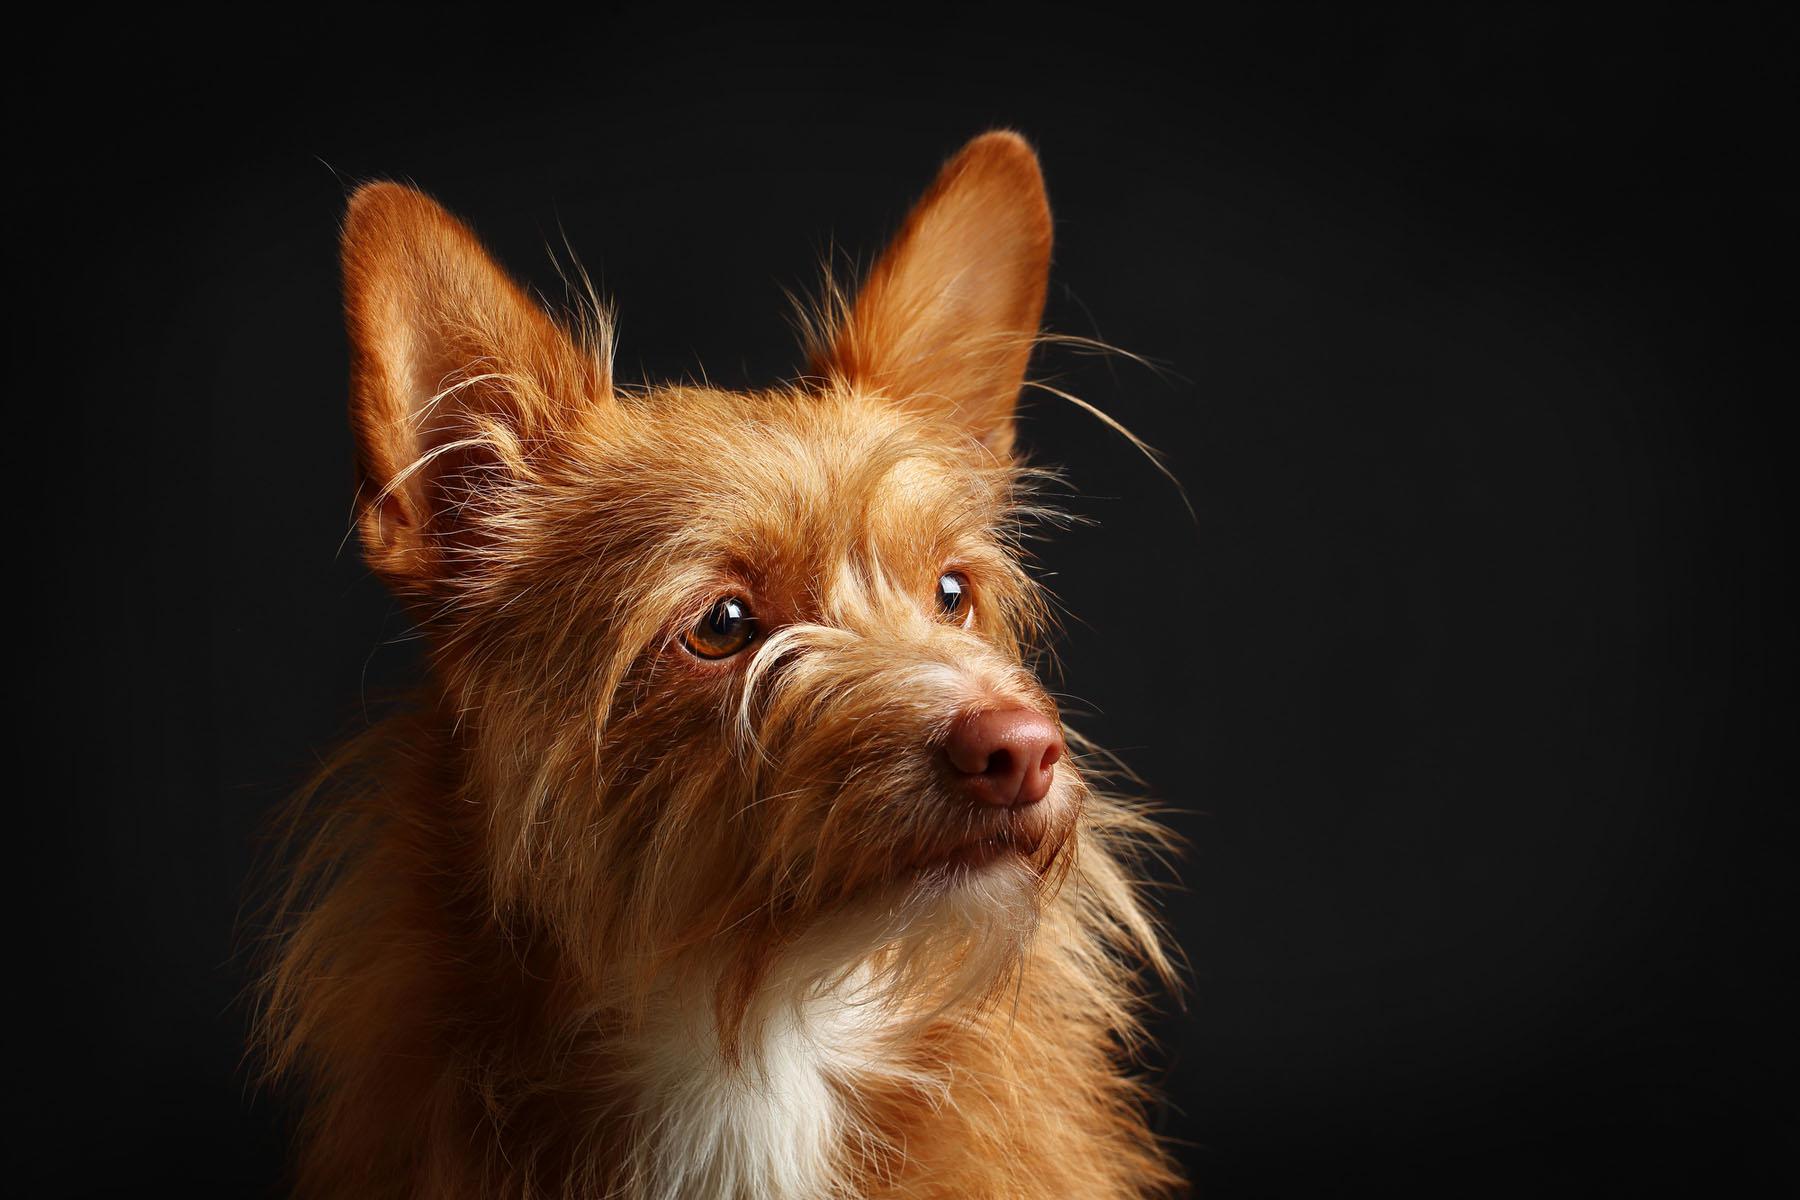 fotografo de mascotas barcelona